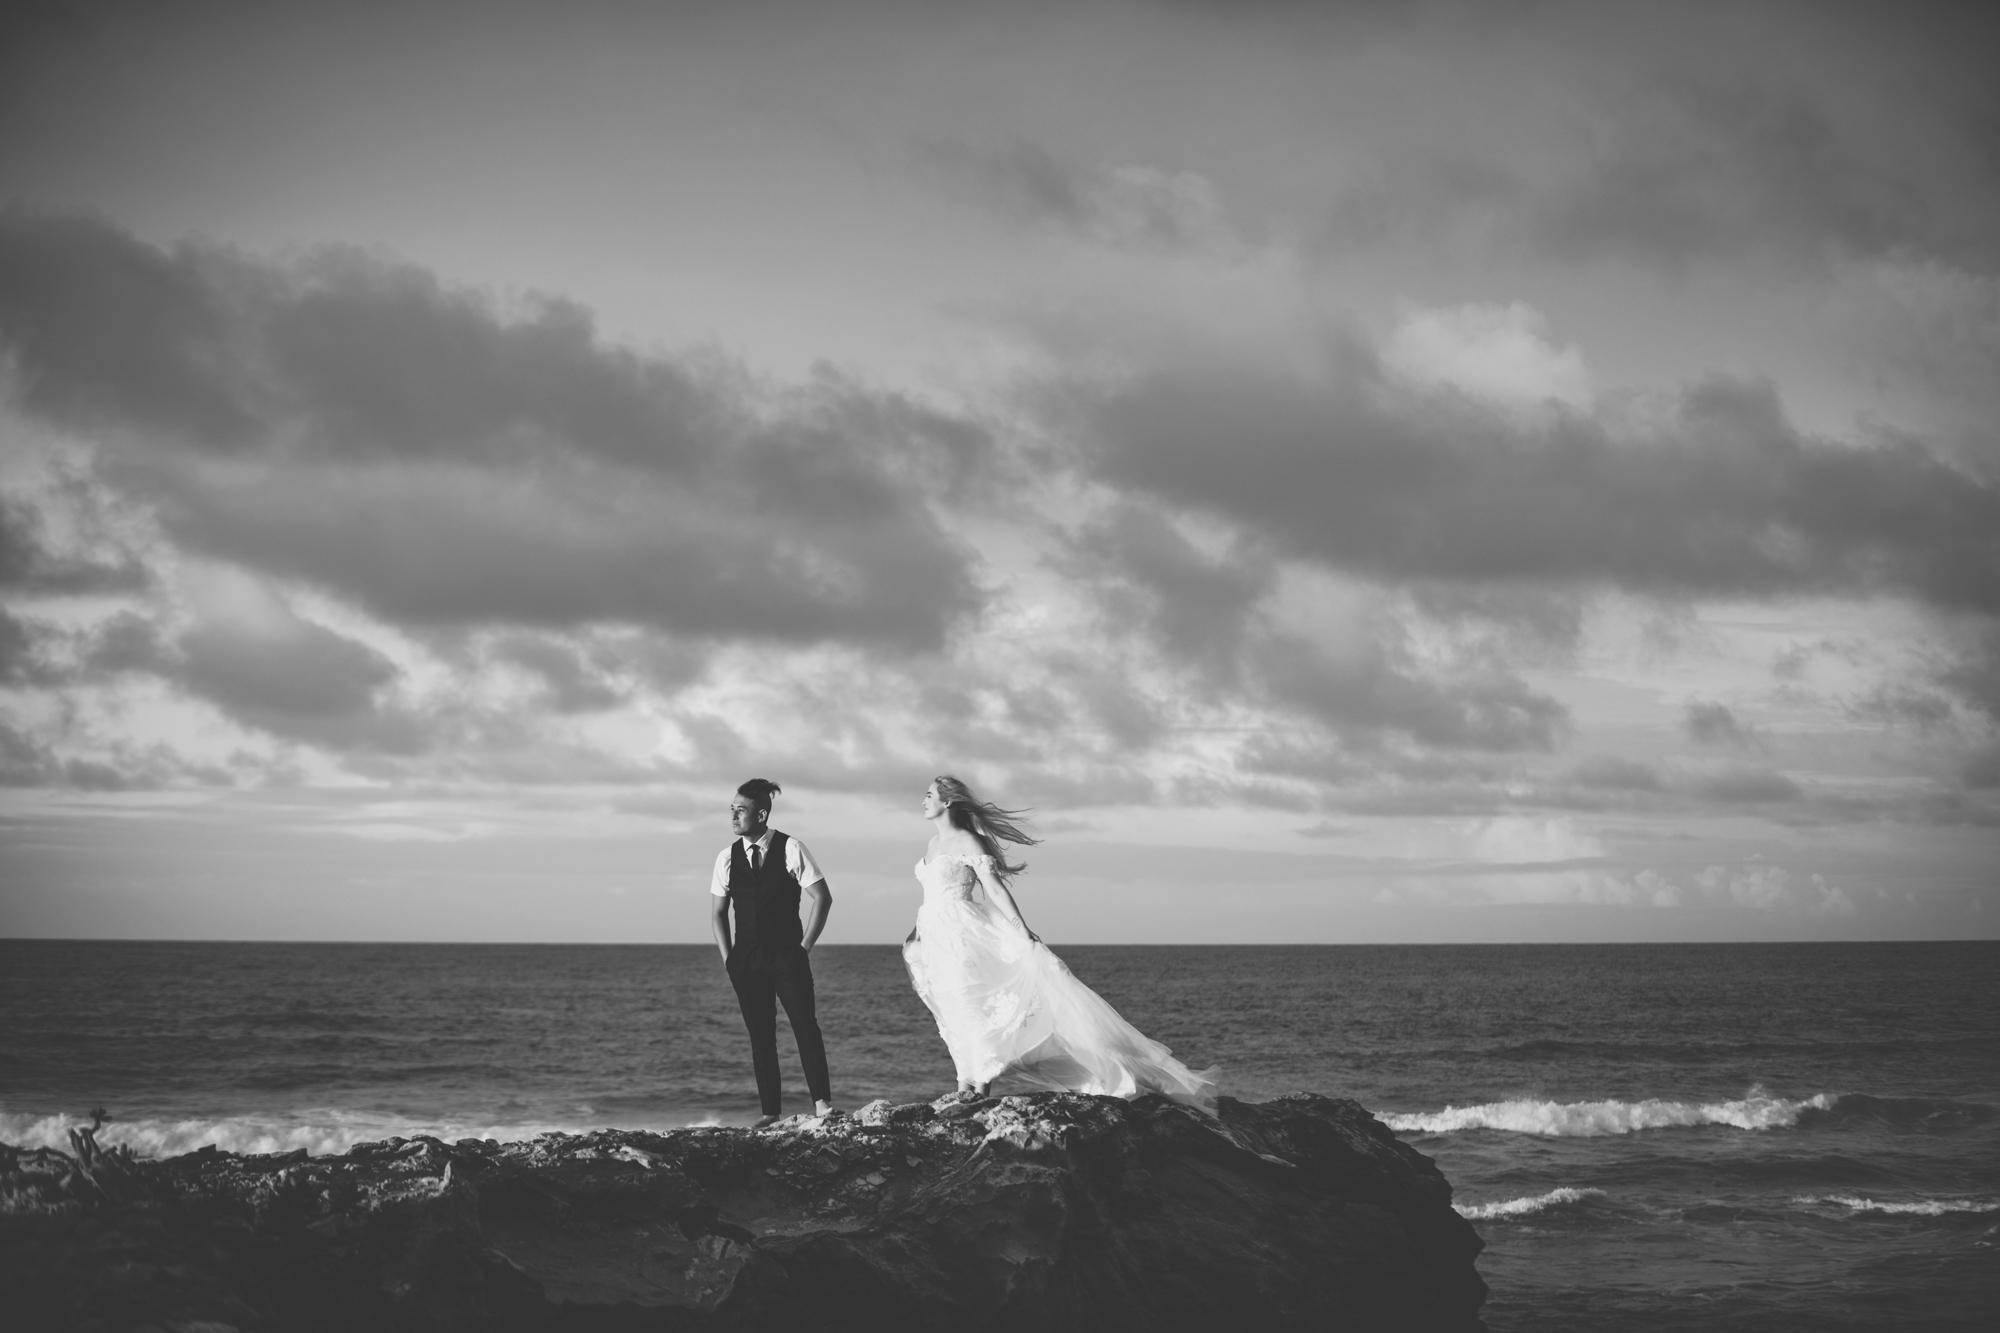 sunrise-wedding-coleen-shipwrecks-6-29-2919-9309.jpg